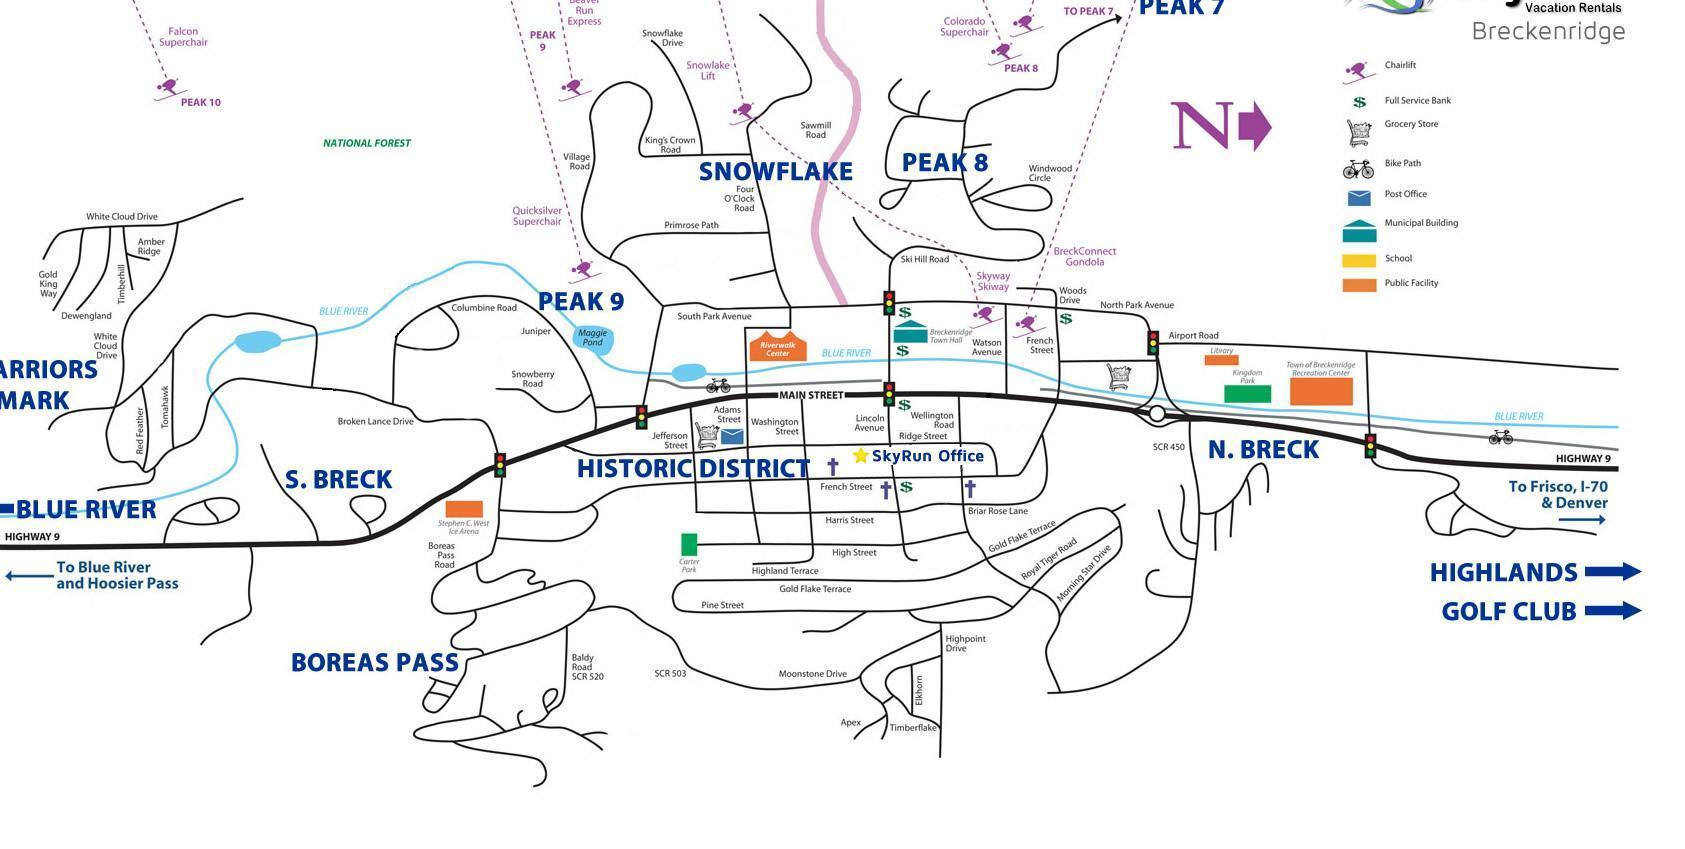 breckenridge resort map. breckenridge map